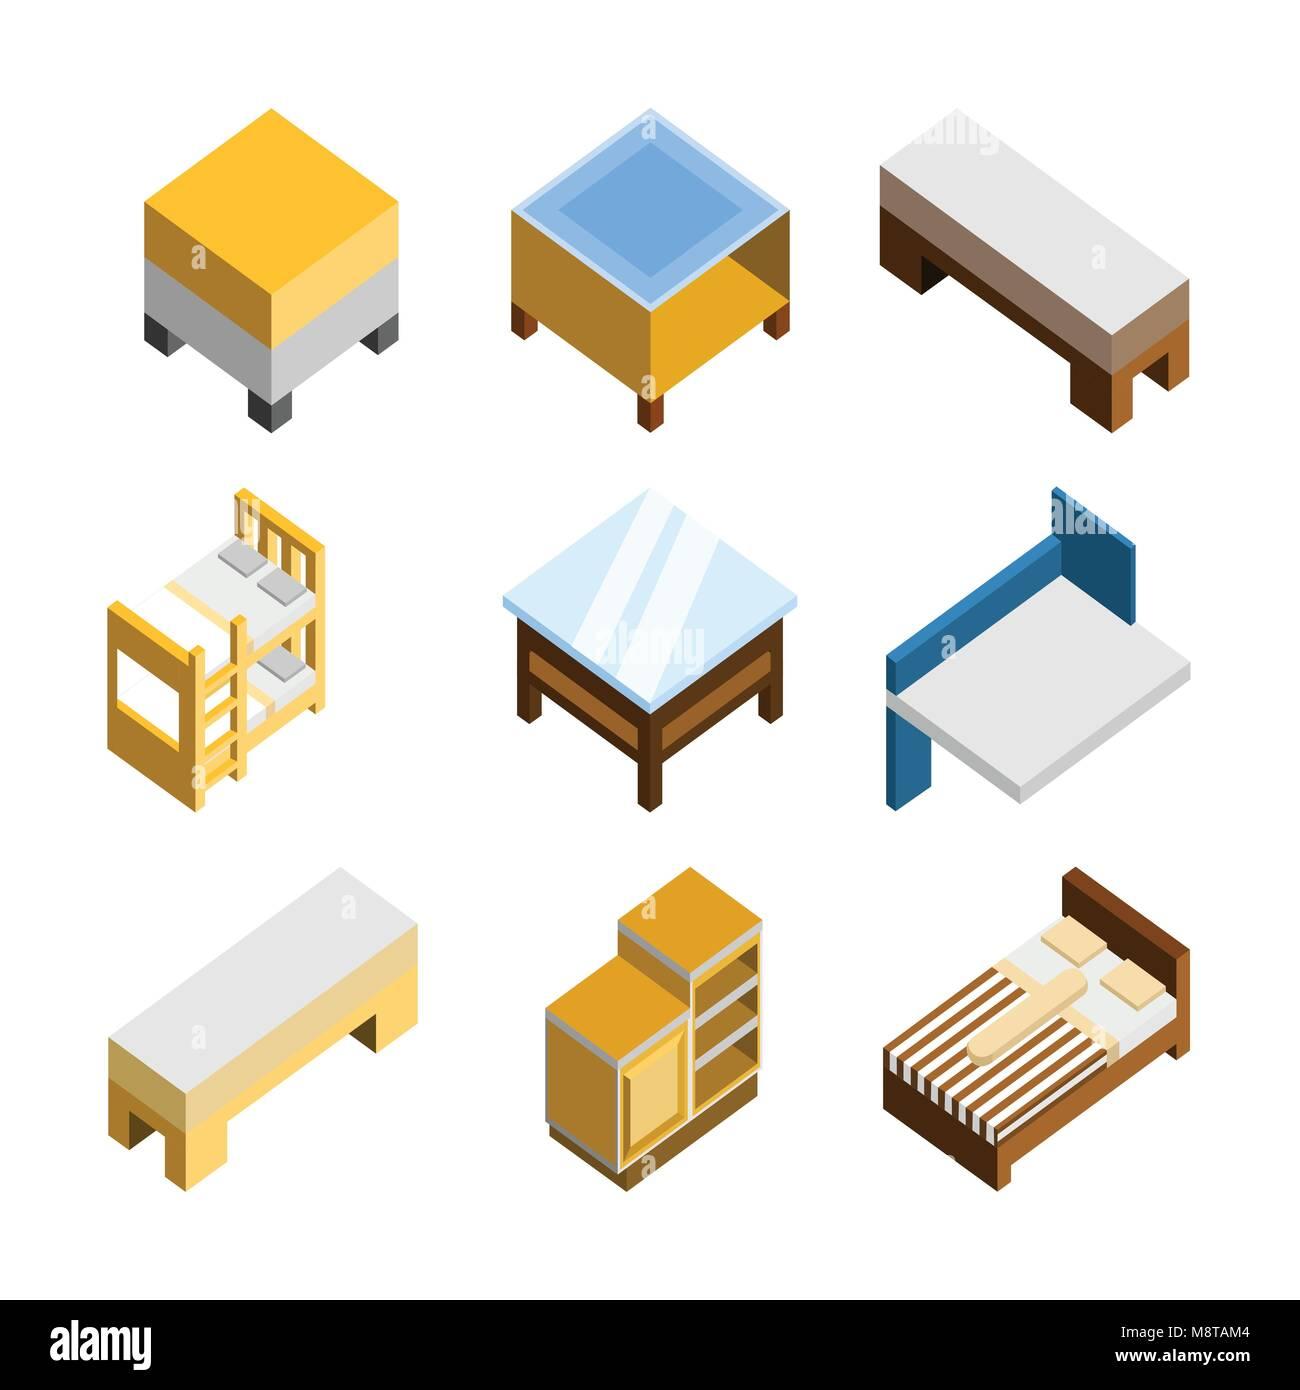 3d Isometrische Home Möbel Vector Illustration Graphic Design Vektor